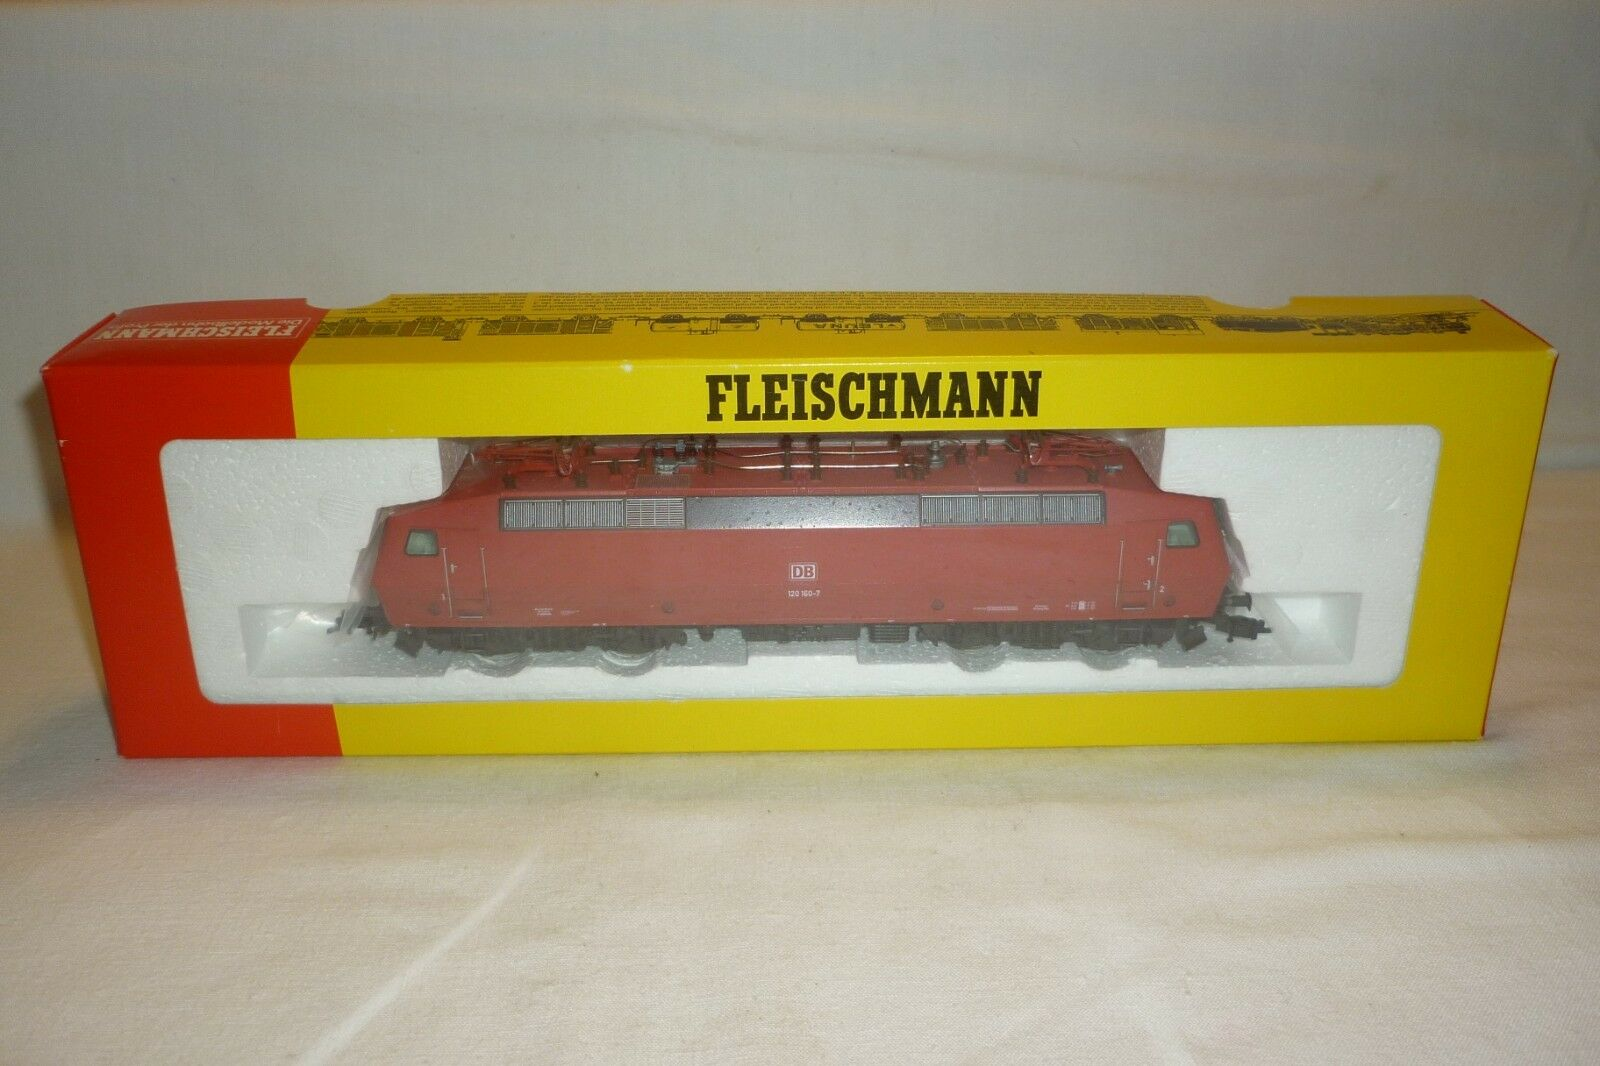 FLEISCHMANN - SPUR H0 - 4352 ELEKTRO ELEKTRO ELEKTRO LOKOMOTIVE DB 120 160-7  -  OVP (8.EI-76) f30d0e